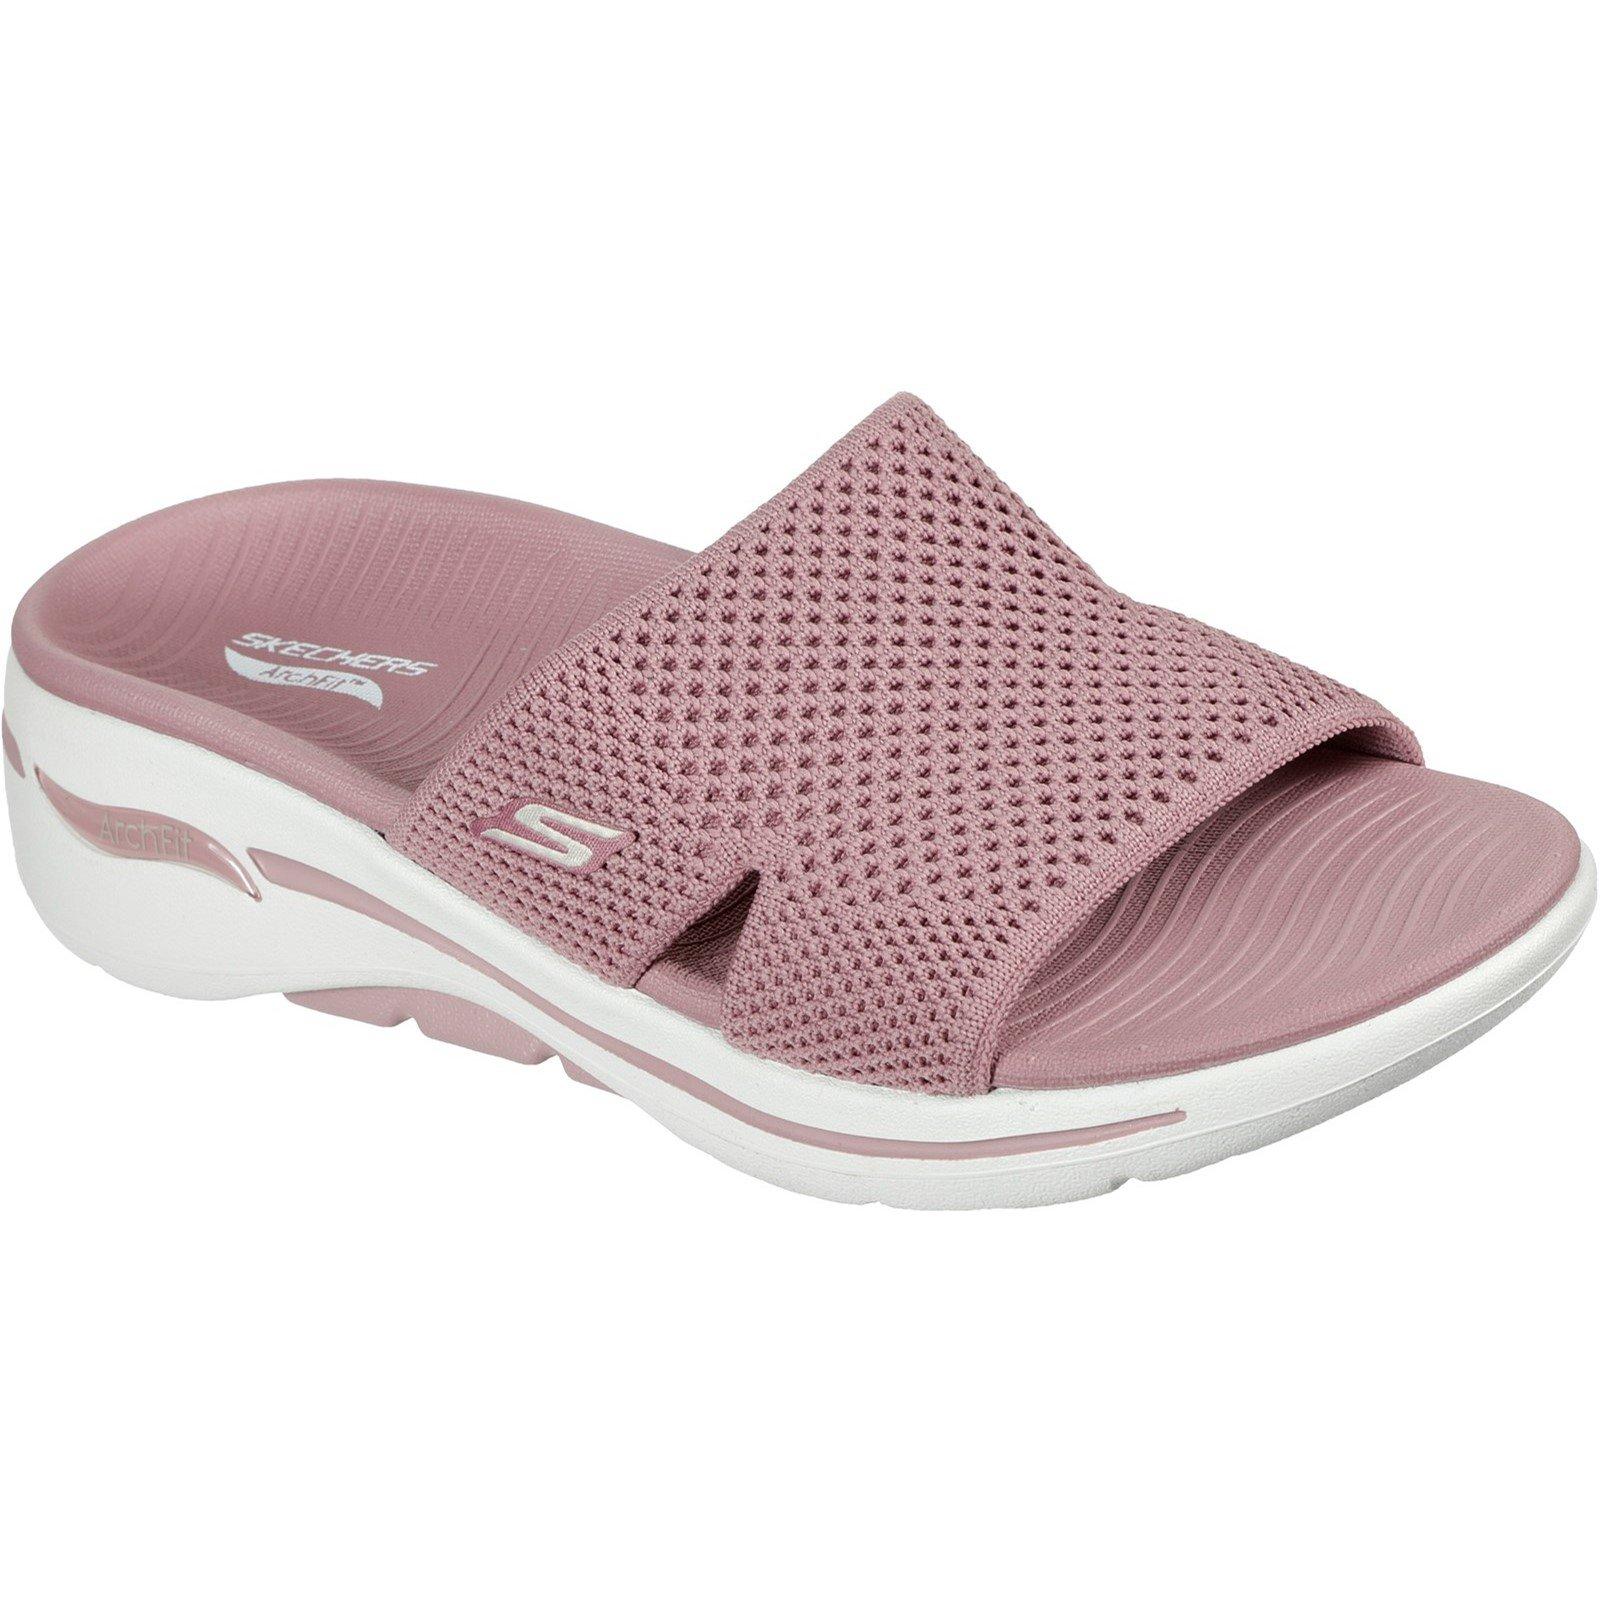 Skechers Women's Go Walk Arch Fit Worthy Summer Sandal Various Colours 32152 - Rose 6